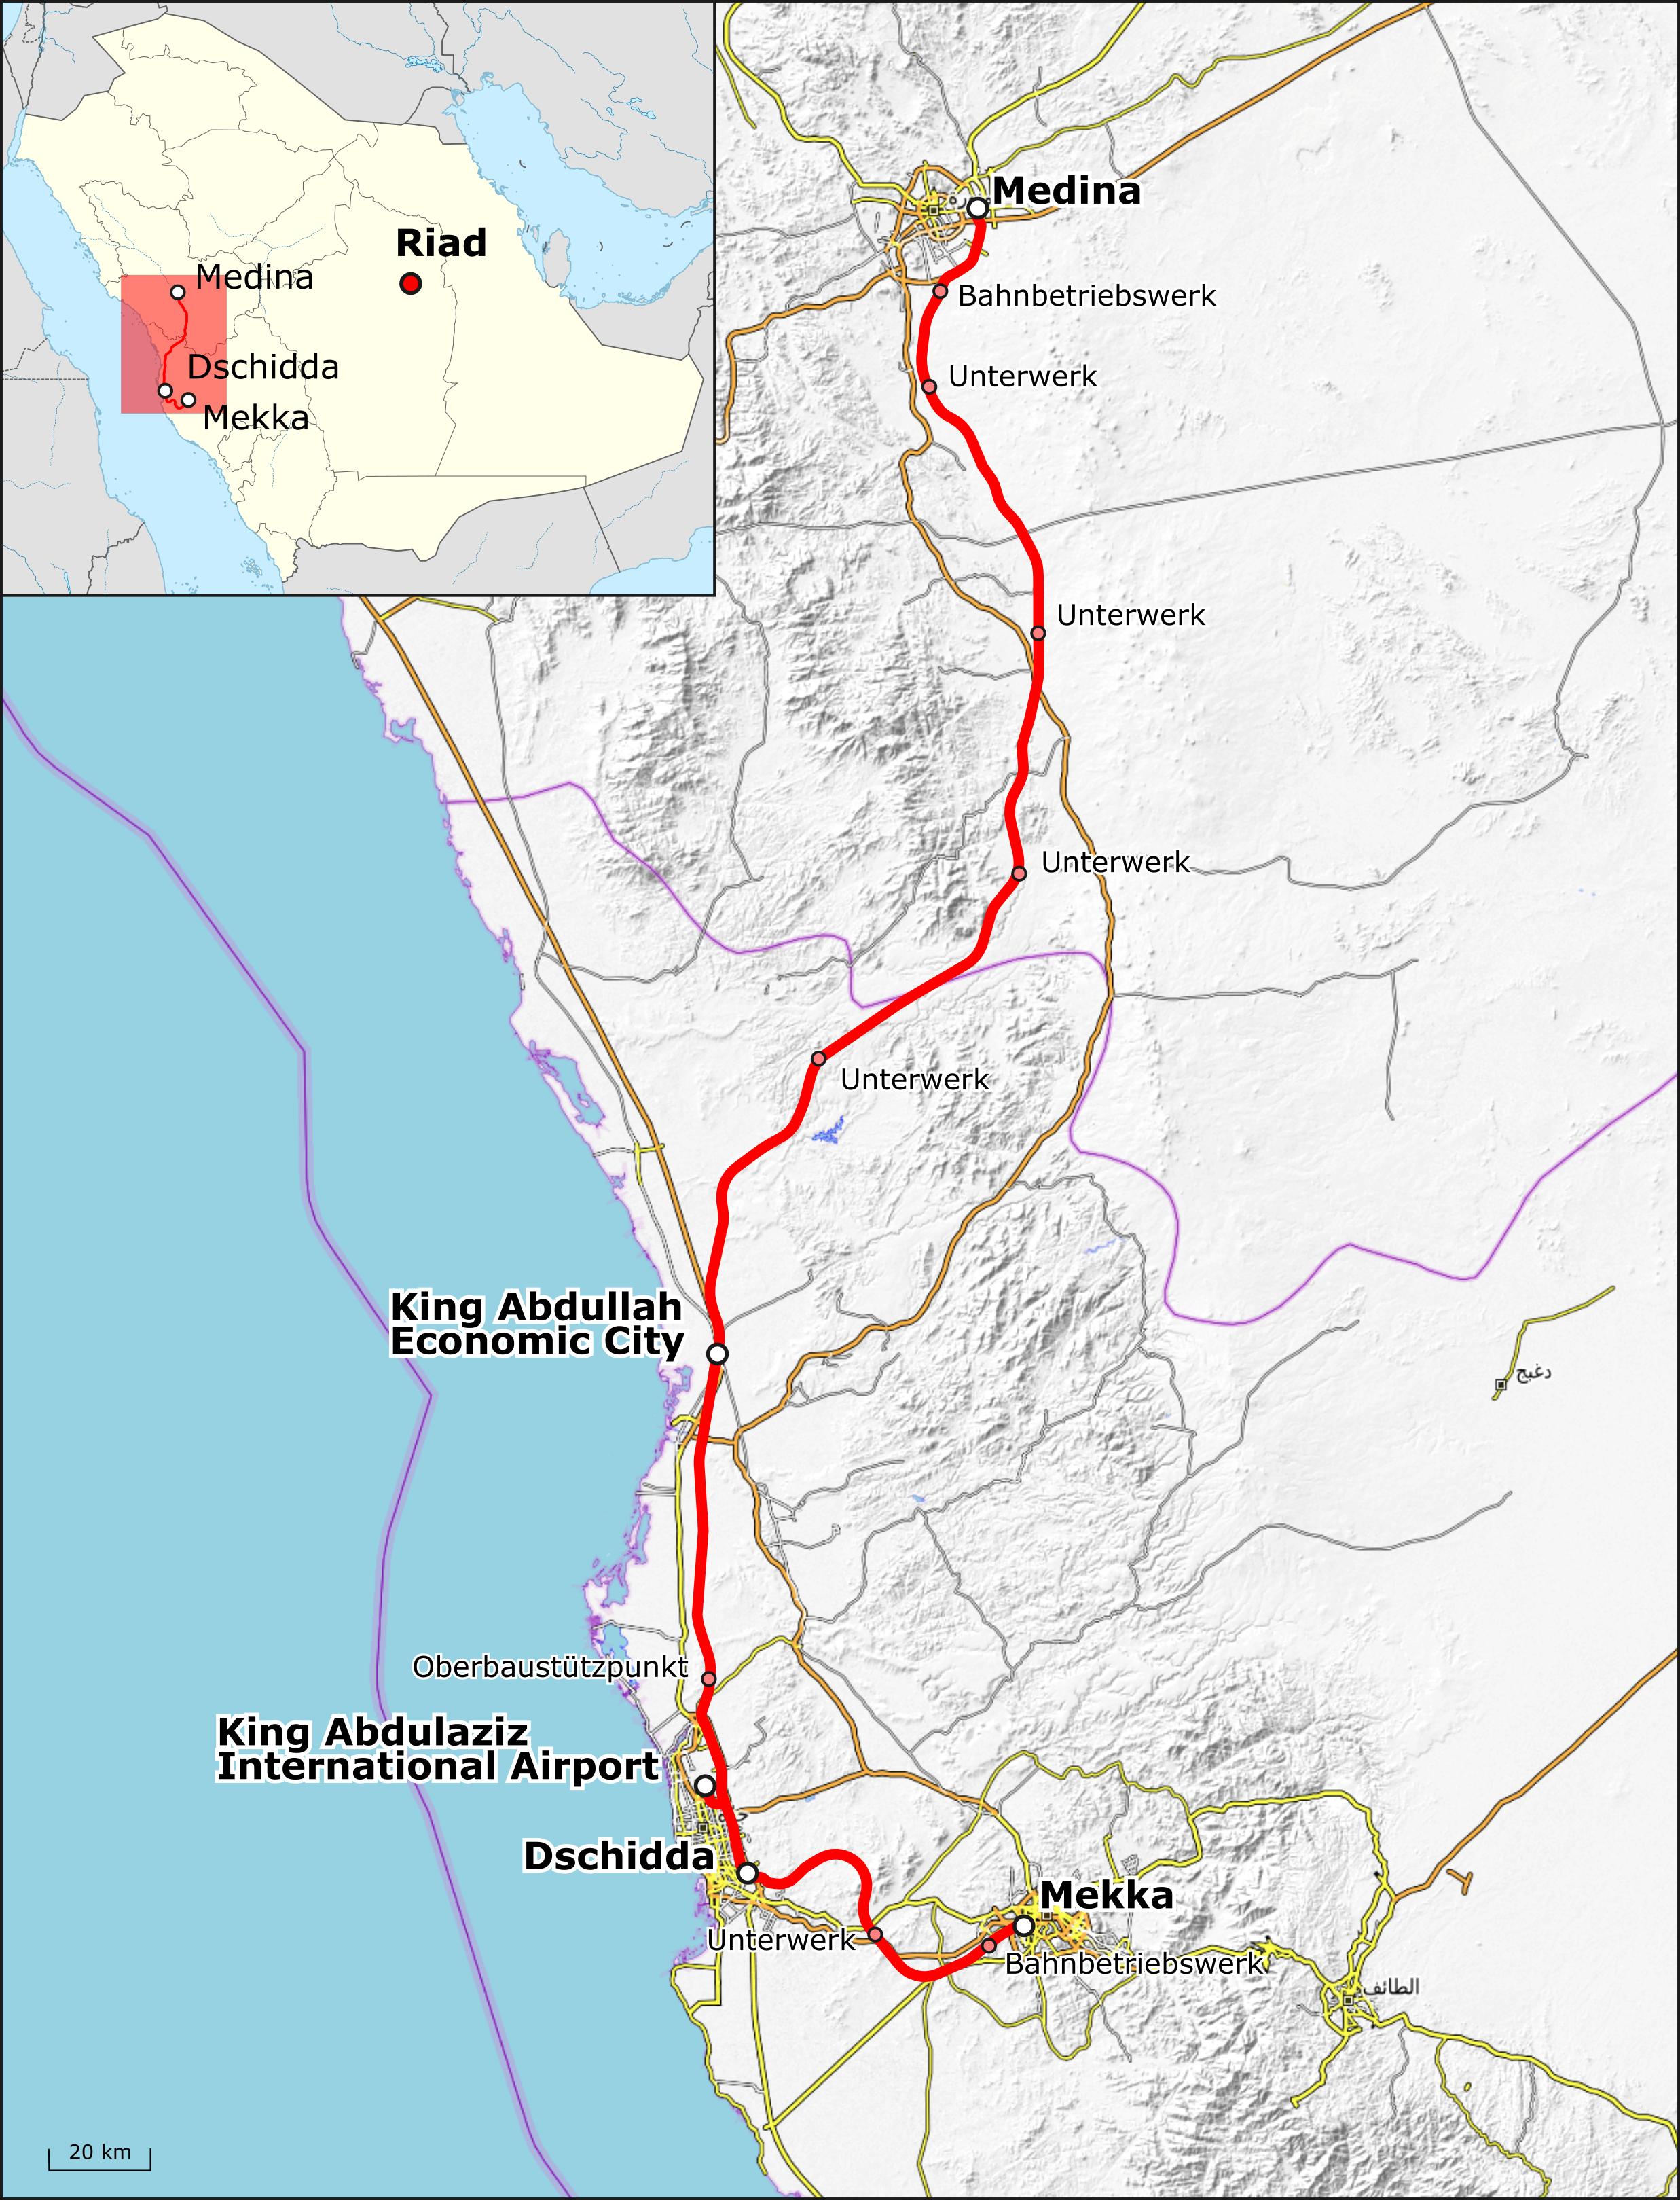 Haramain high-speed railway - Wikipedia